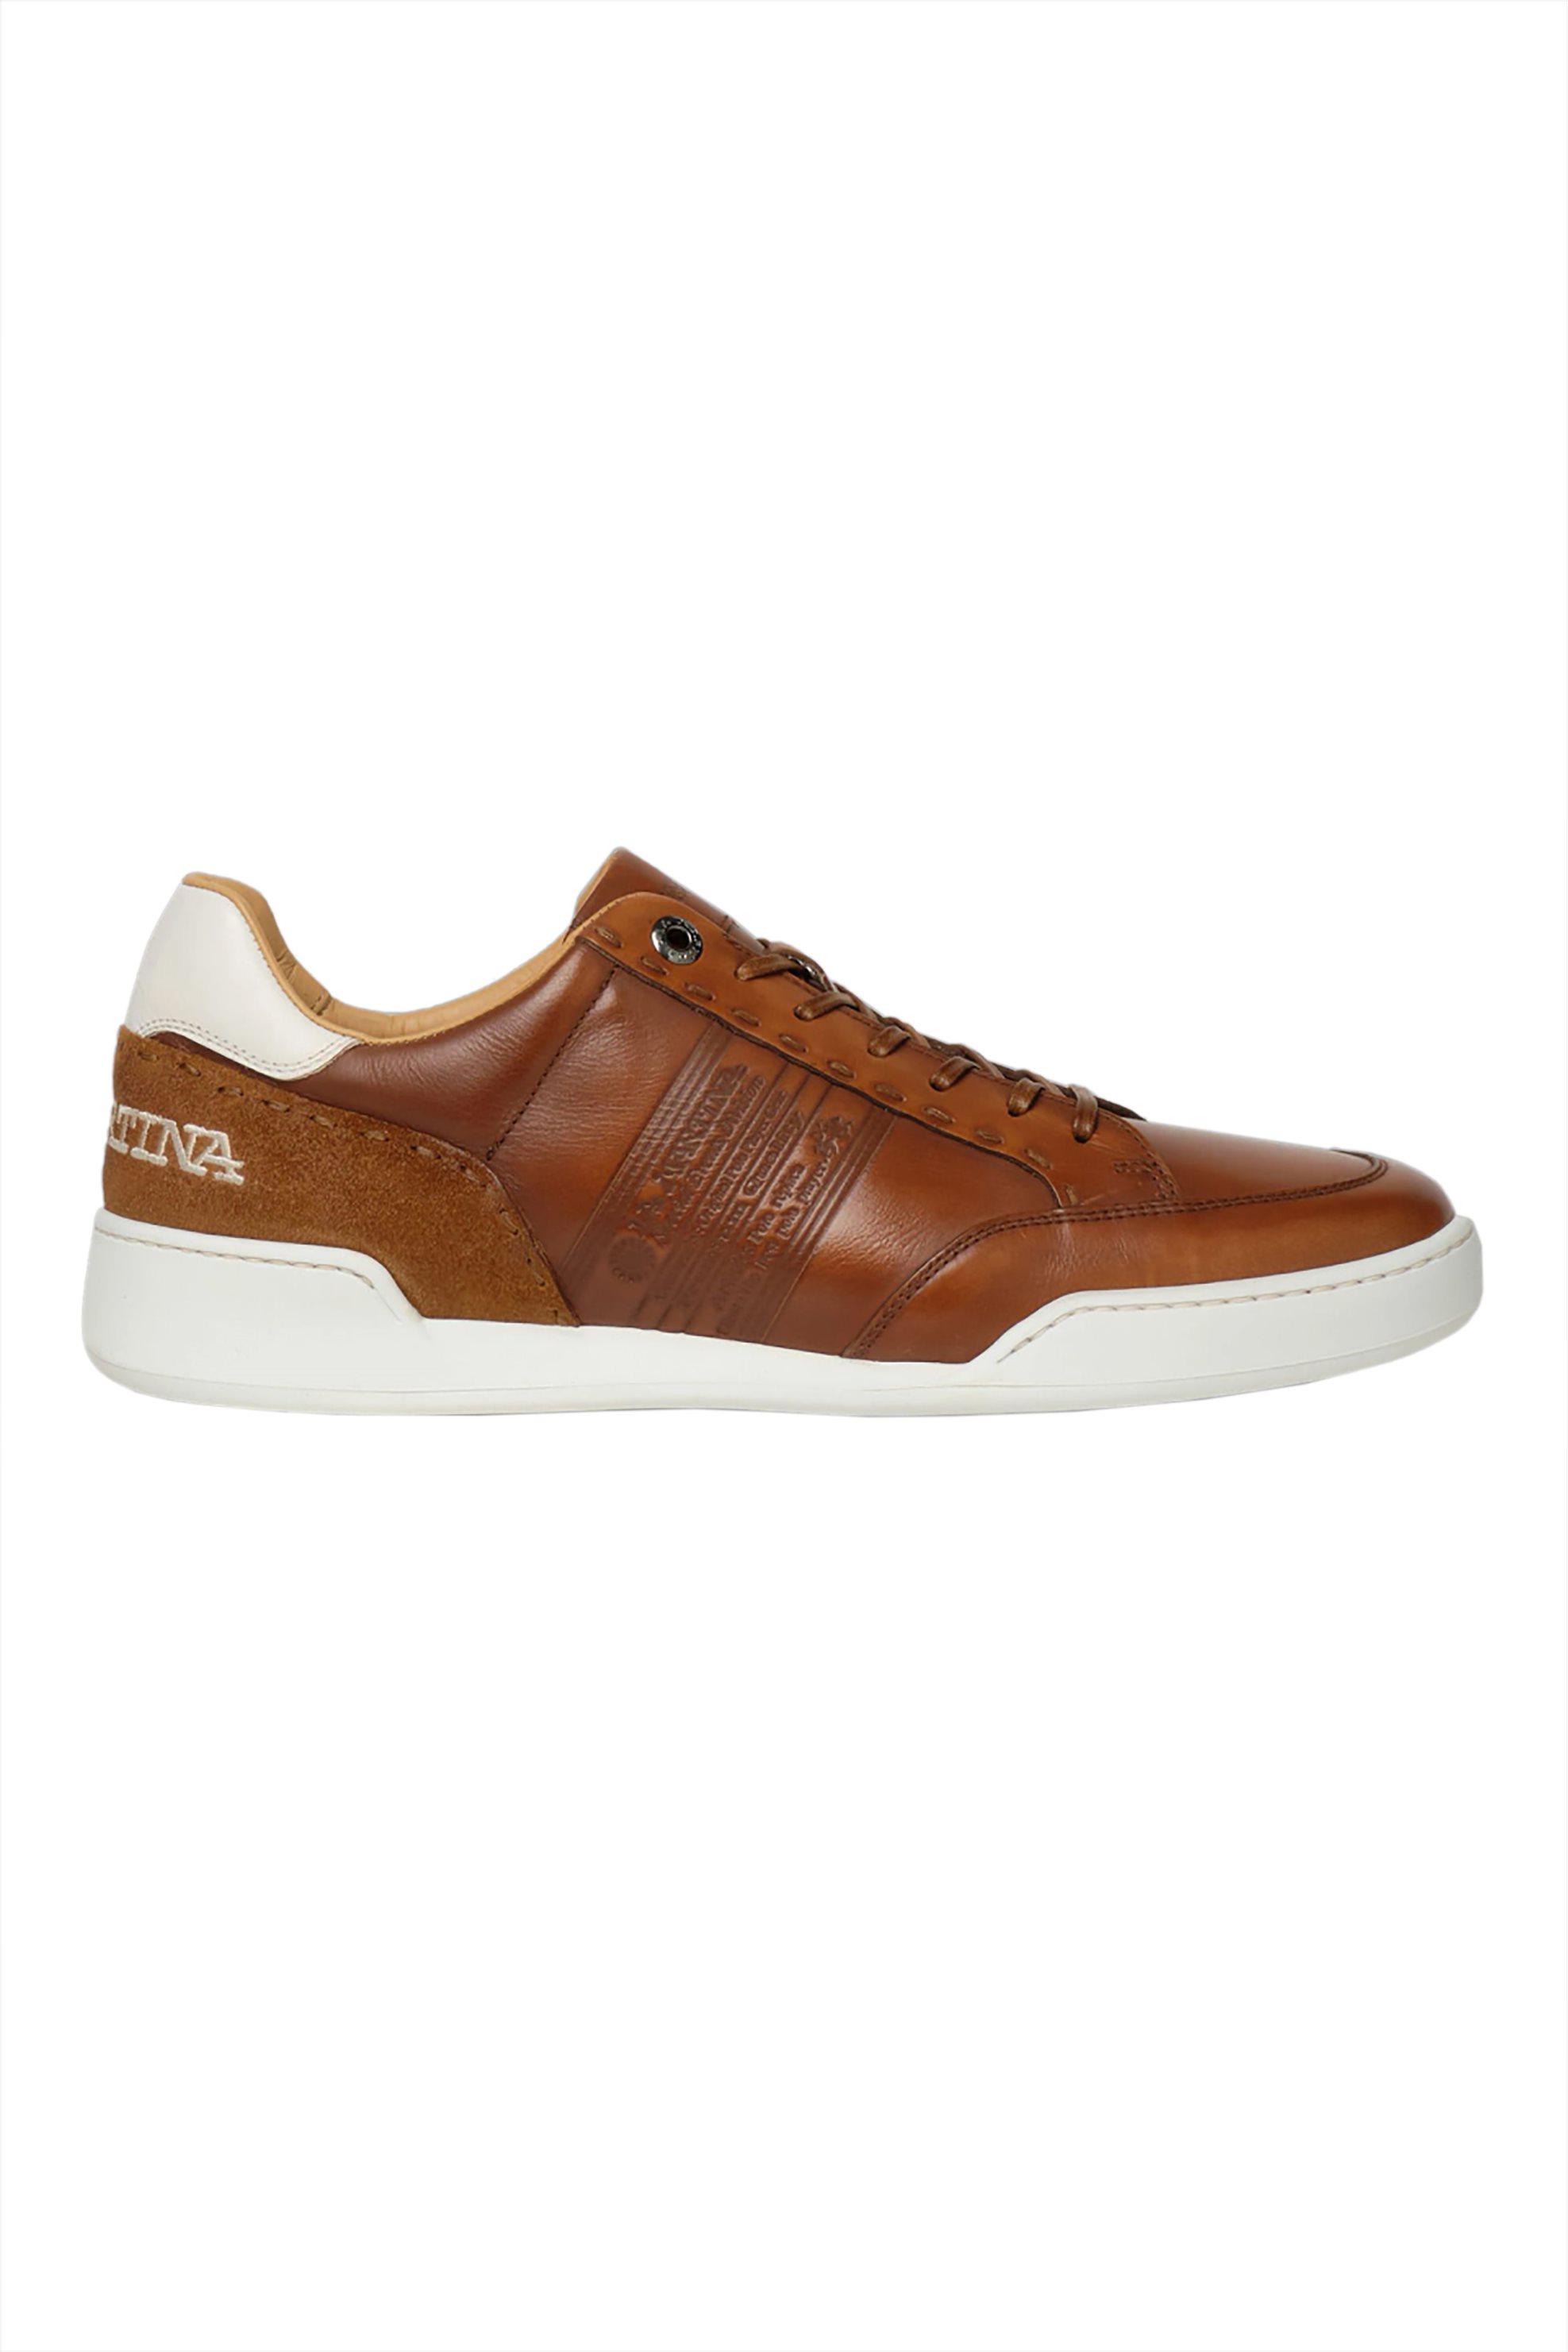 La Martina ανδρικά sneakers με διακοσμητικές ραφές και contrast λεπτομέρειες – LFM211040-2240 – Ταμπά